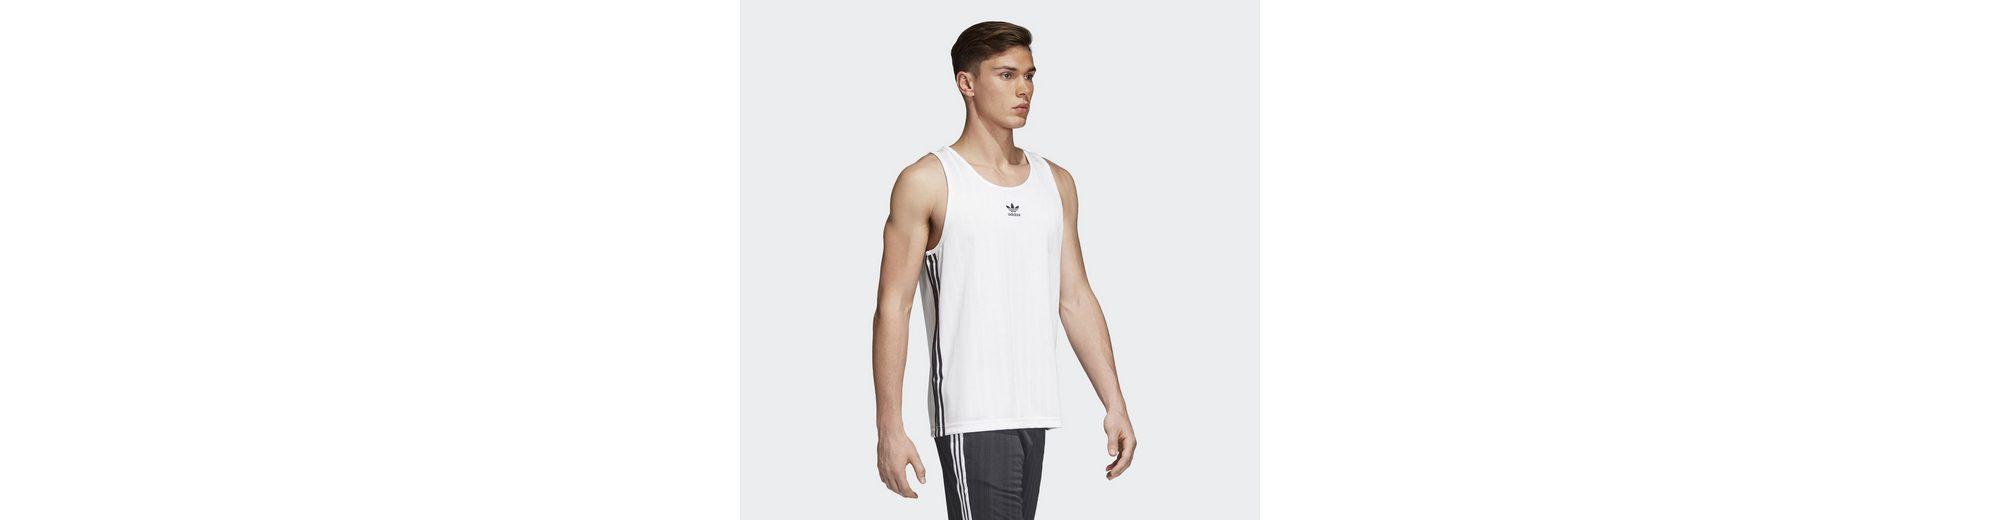 adidas Originals Sporttop Football Tanktop Große Auswahl An Zum Verkauf geUwaon